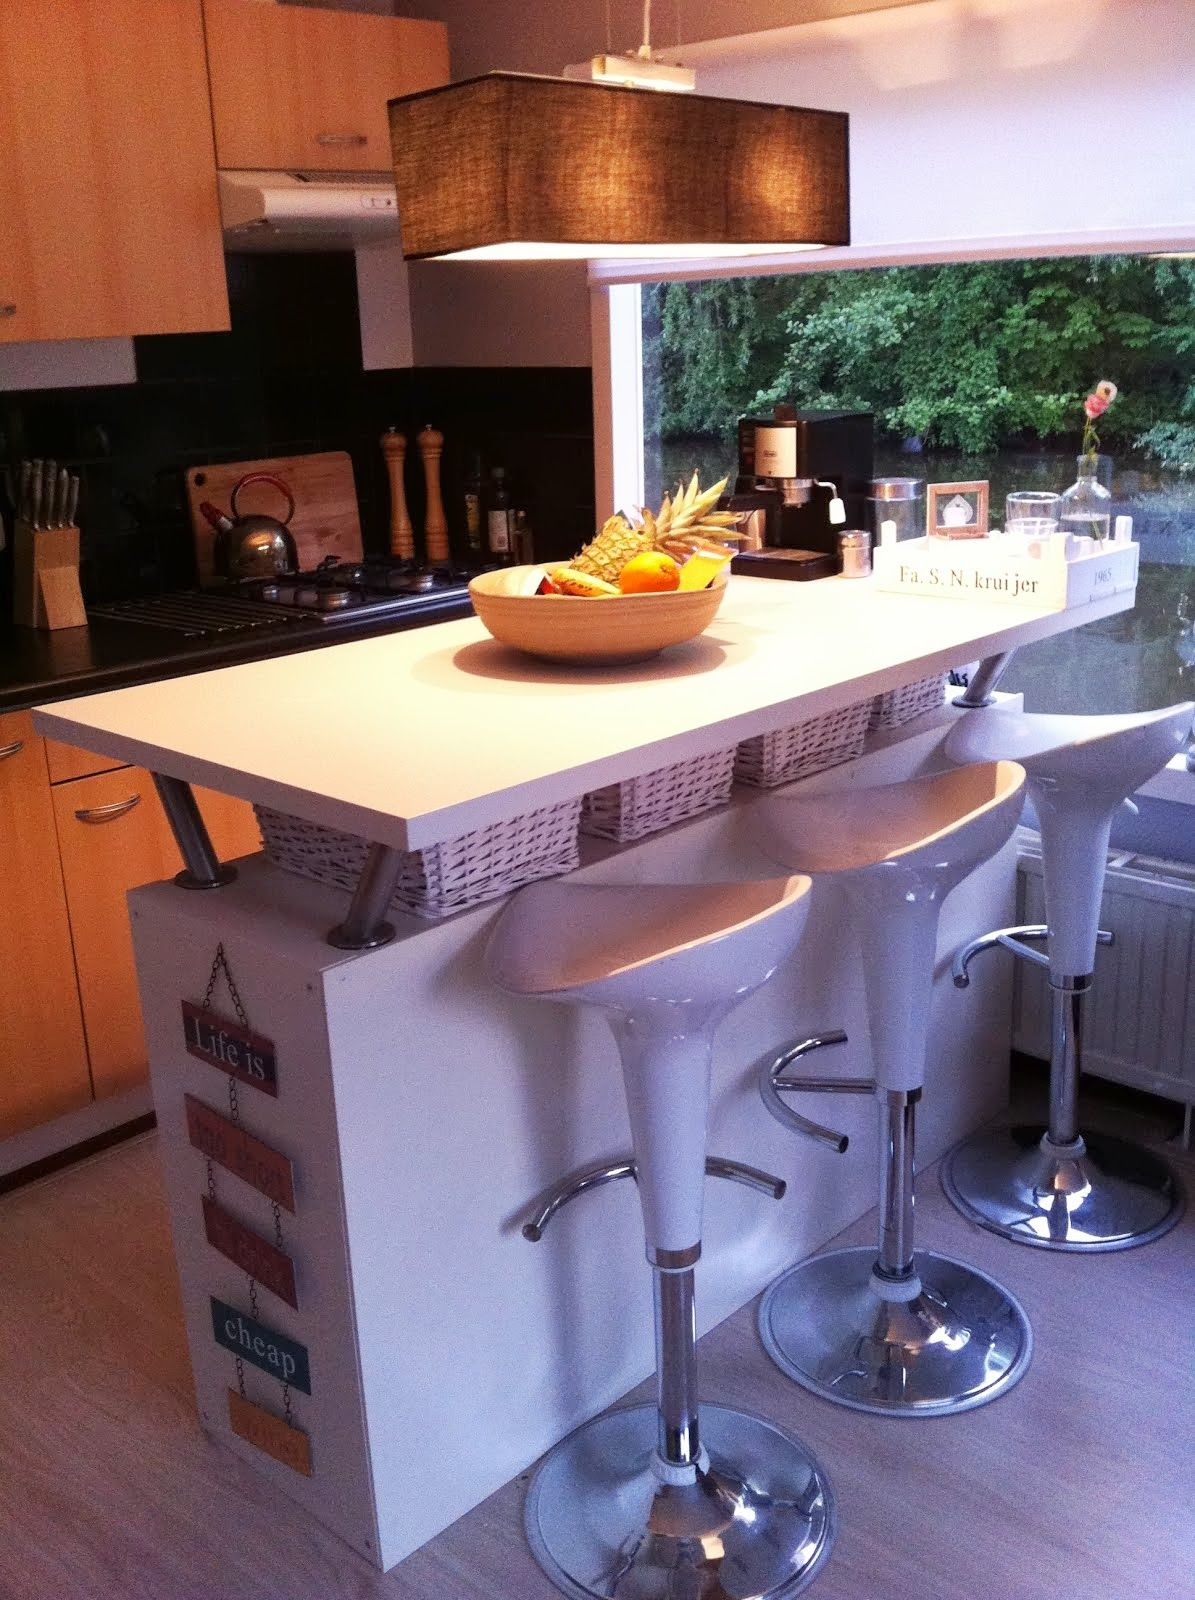 15 Awesome IKEA Hacks To Try | bares | Pinterest | Barras de cocina ...